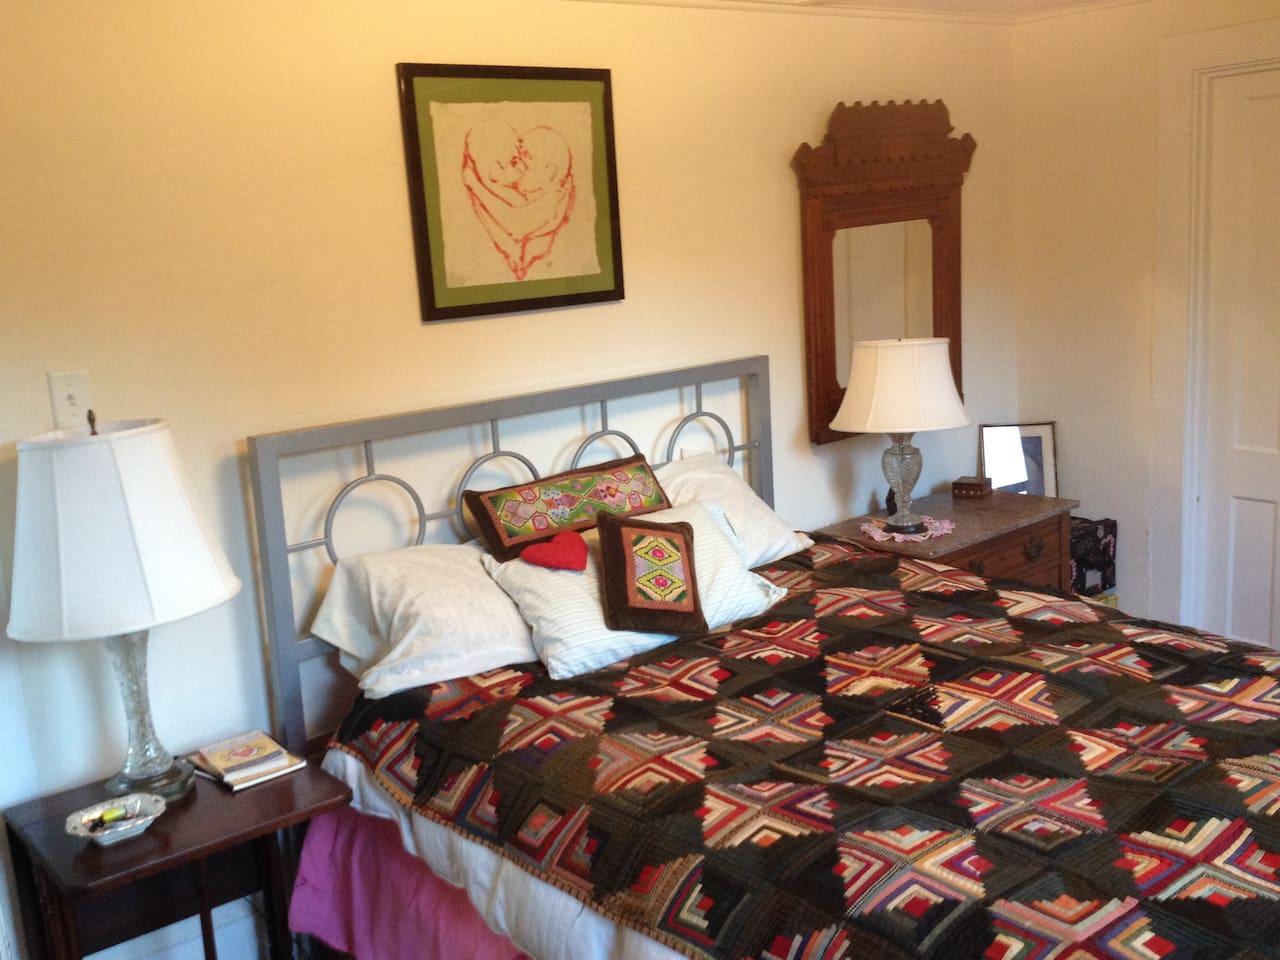 Great grandma's handmade quilts + goose down comforters = heavenly dreamy sleeps